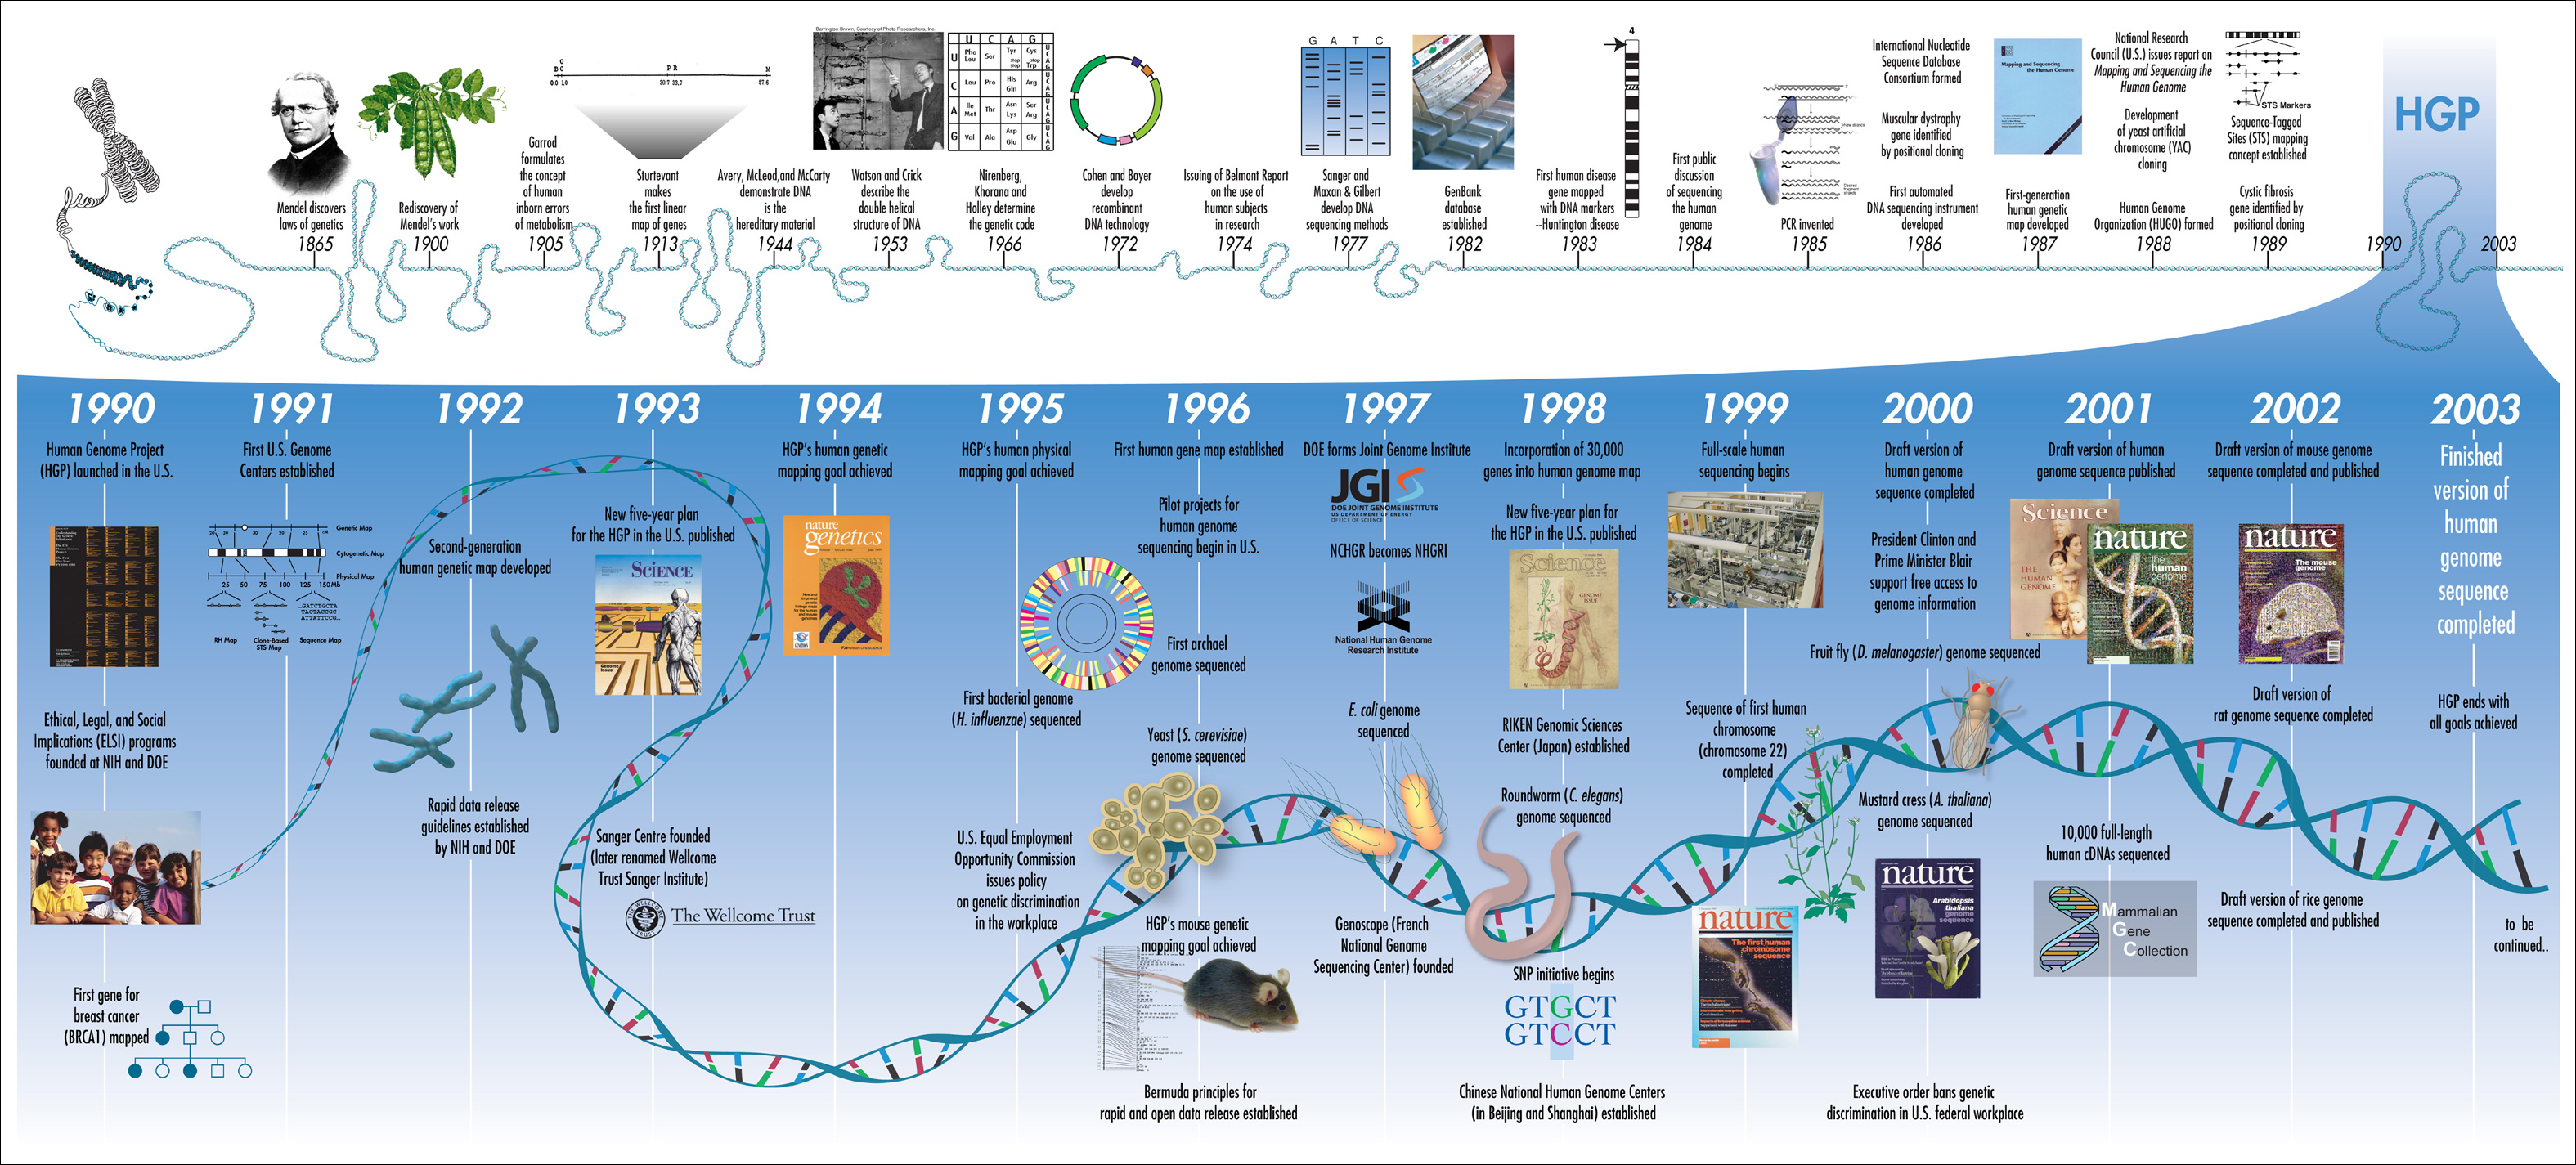 Human Genome Project Nature Vs Nurture